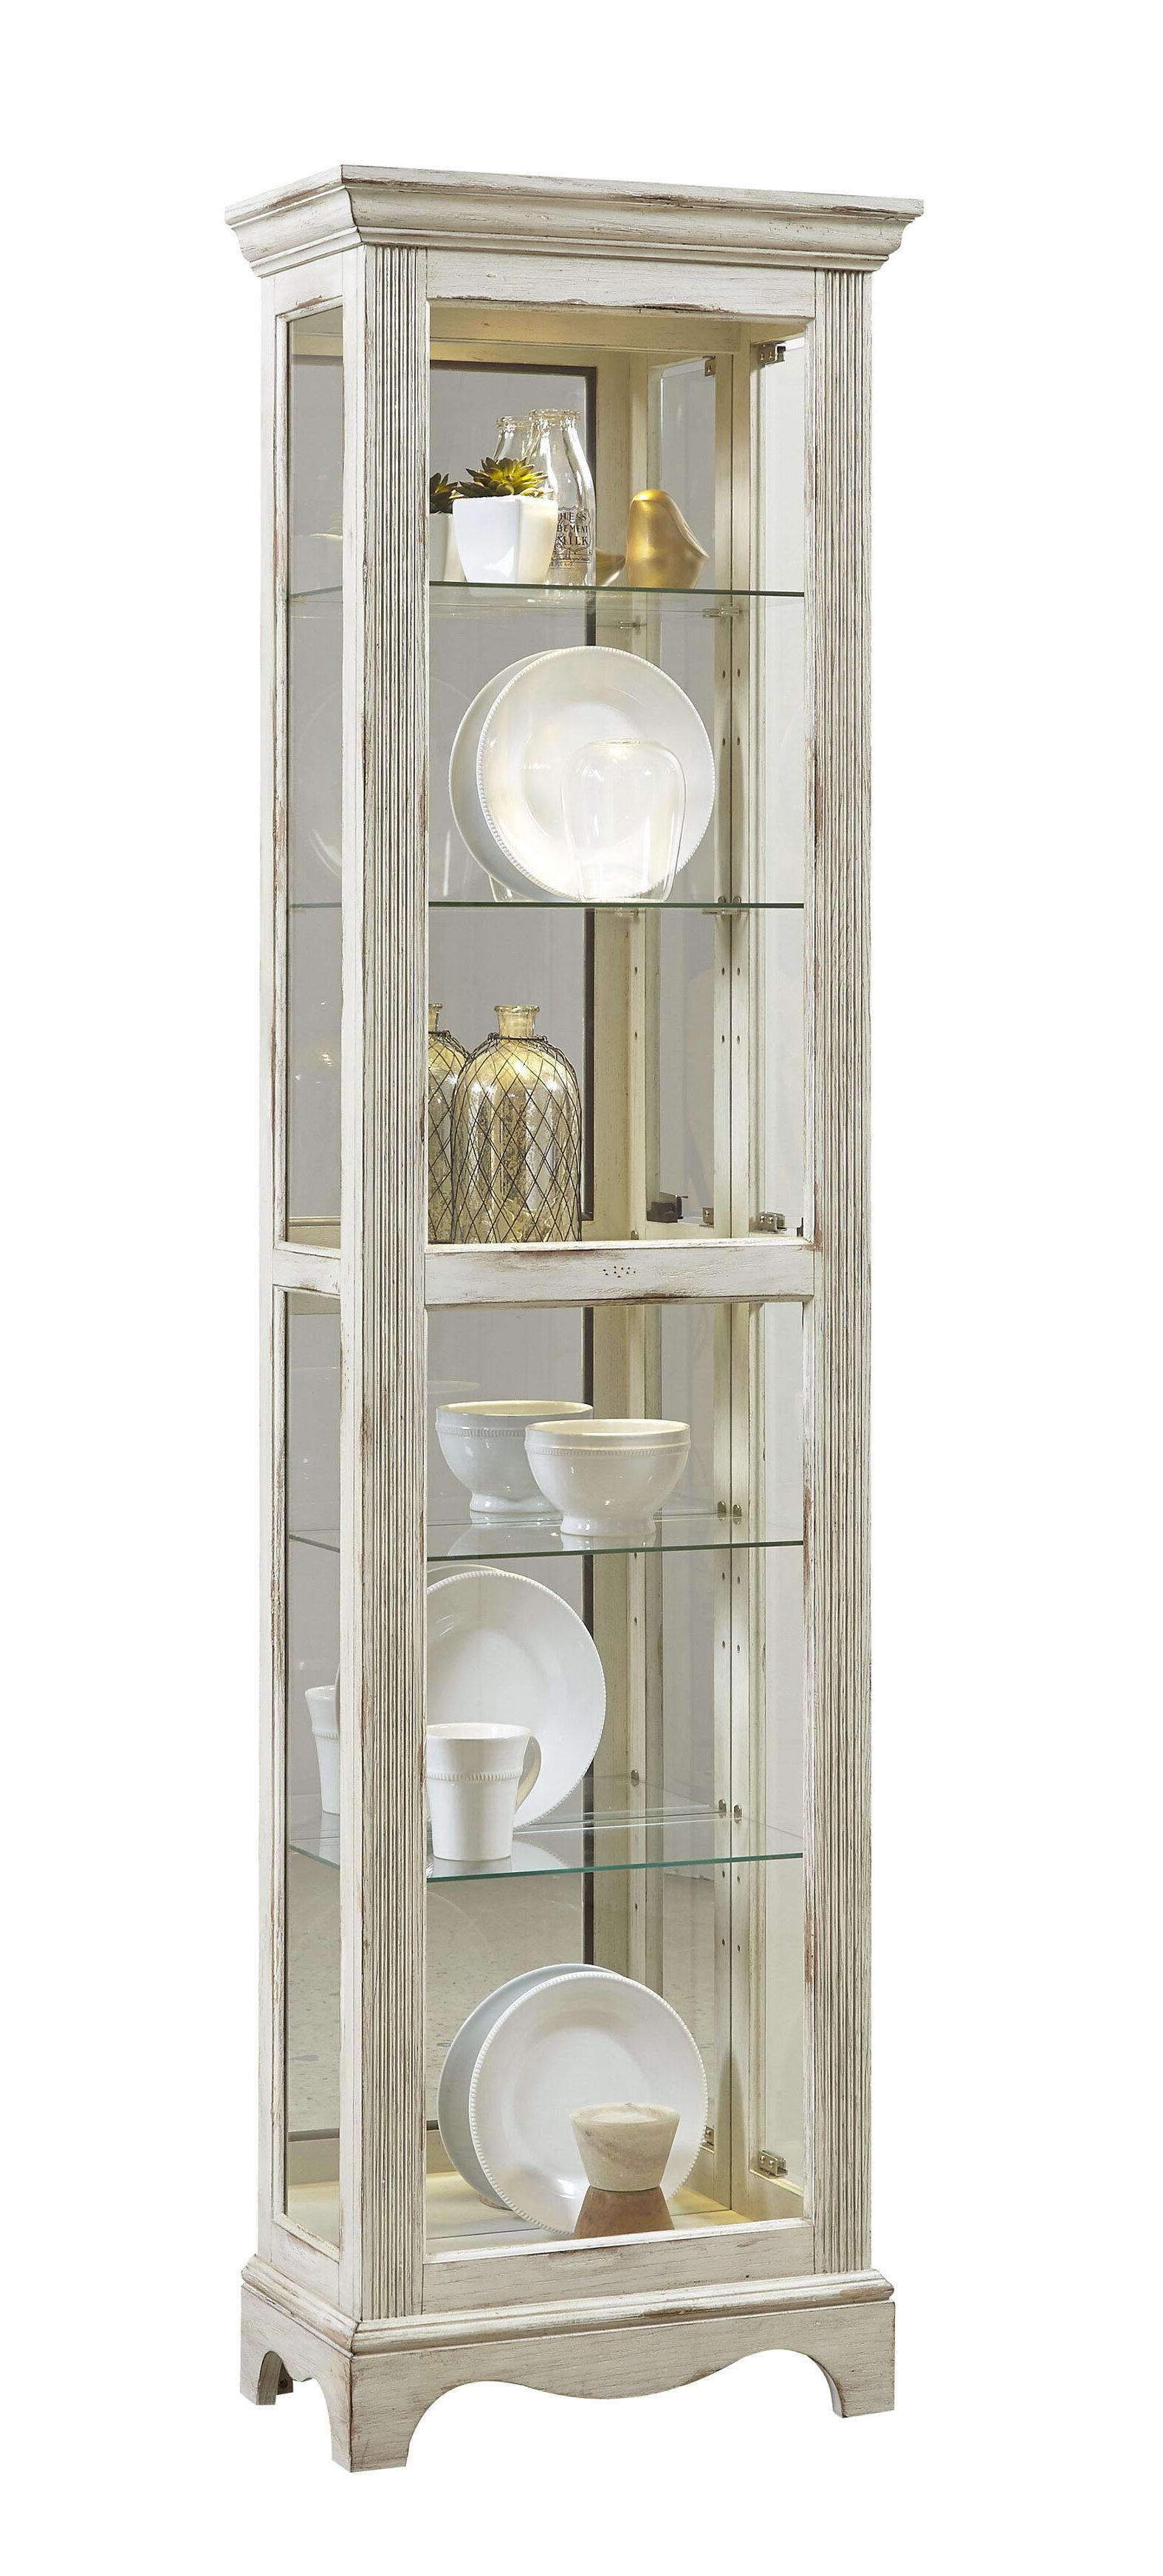 Davie Weathered Standard Curio Cabinet By Beachcrest Home